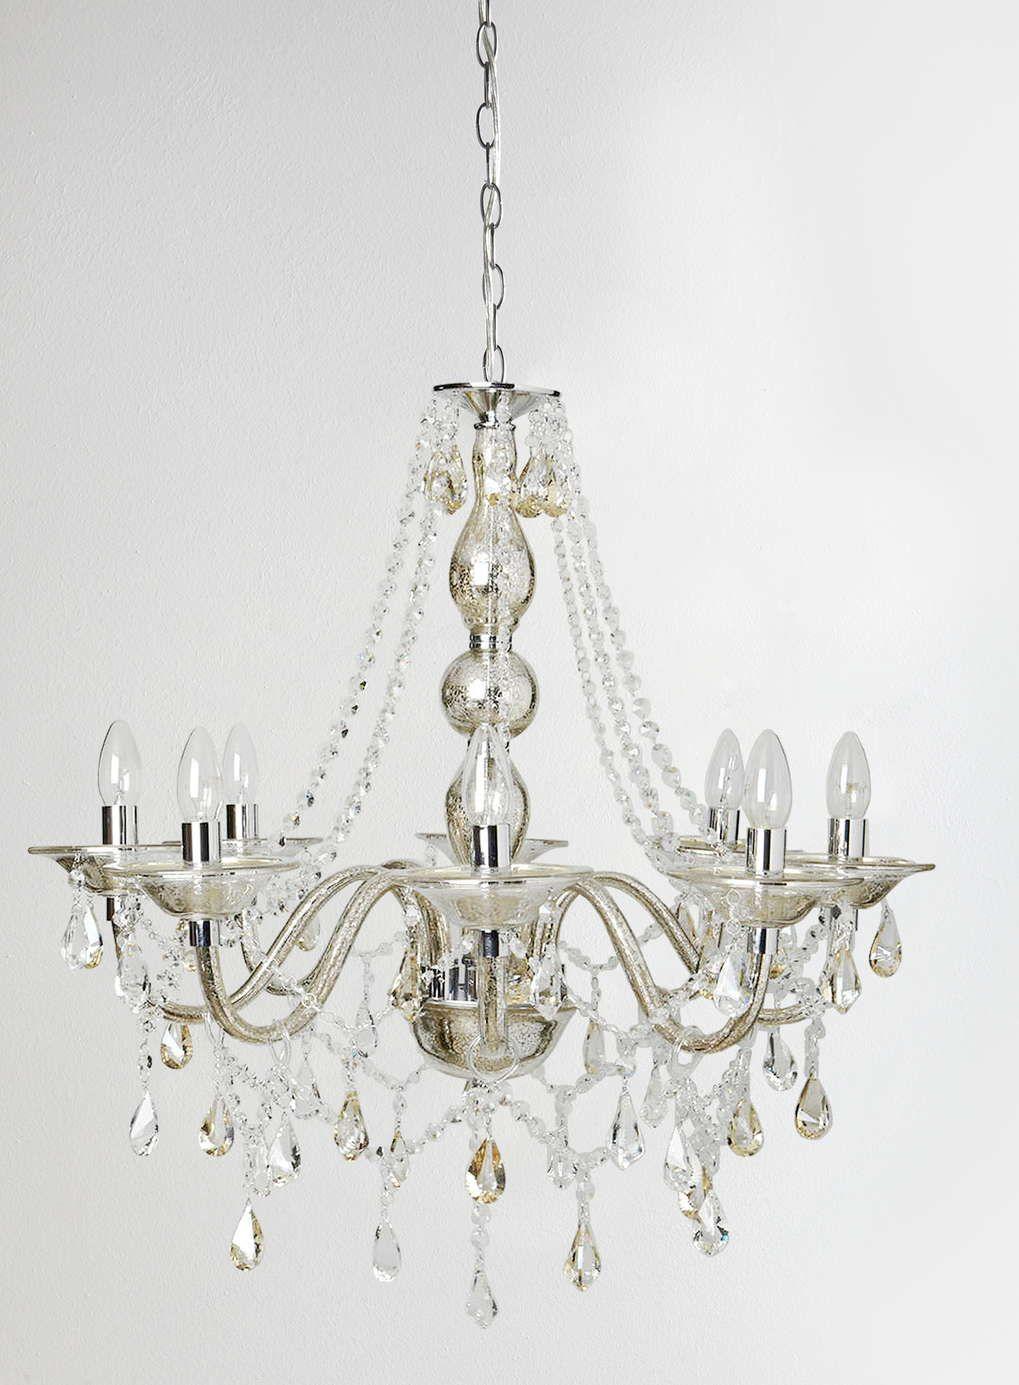 Gold valentine chandelier bhs kitchen ideas pinterest bhs gold valentine chandelier bhs arubaitofo Image collections